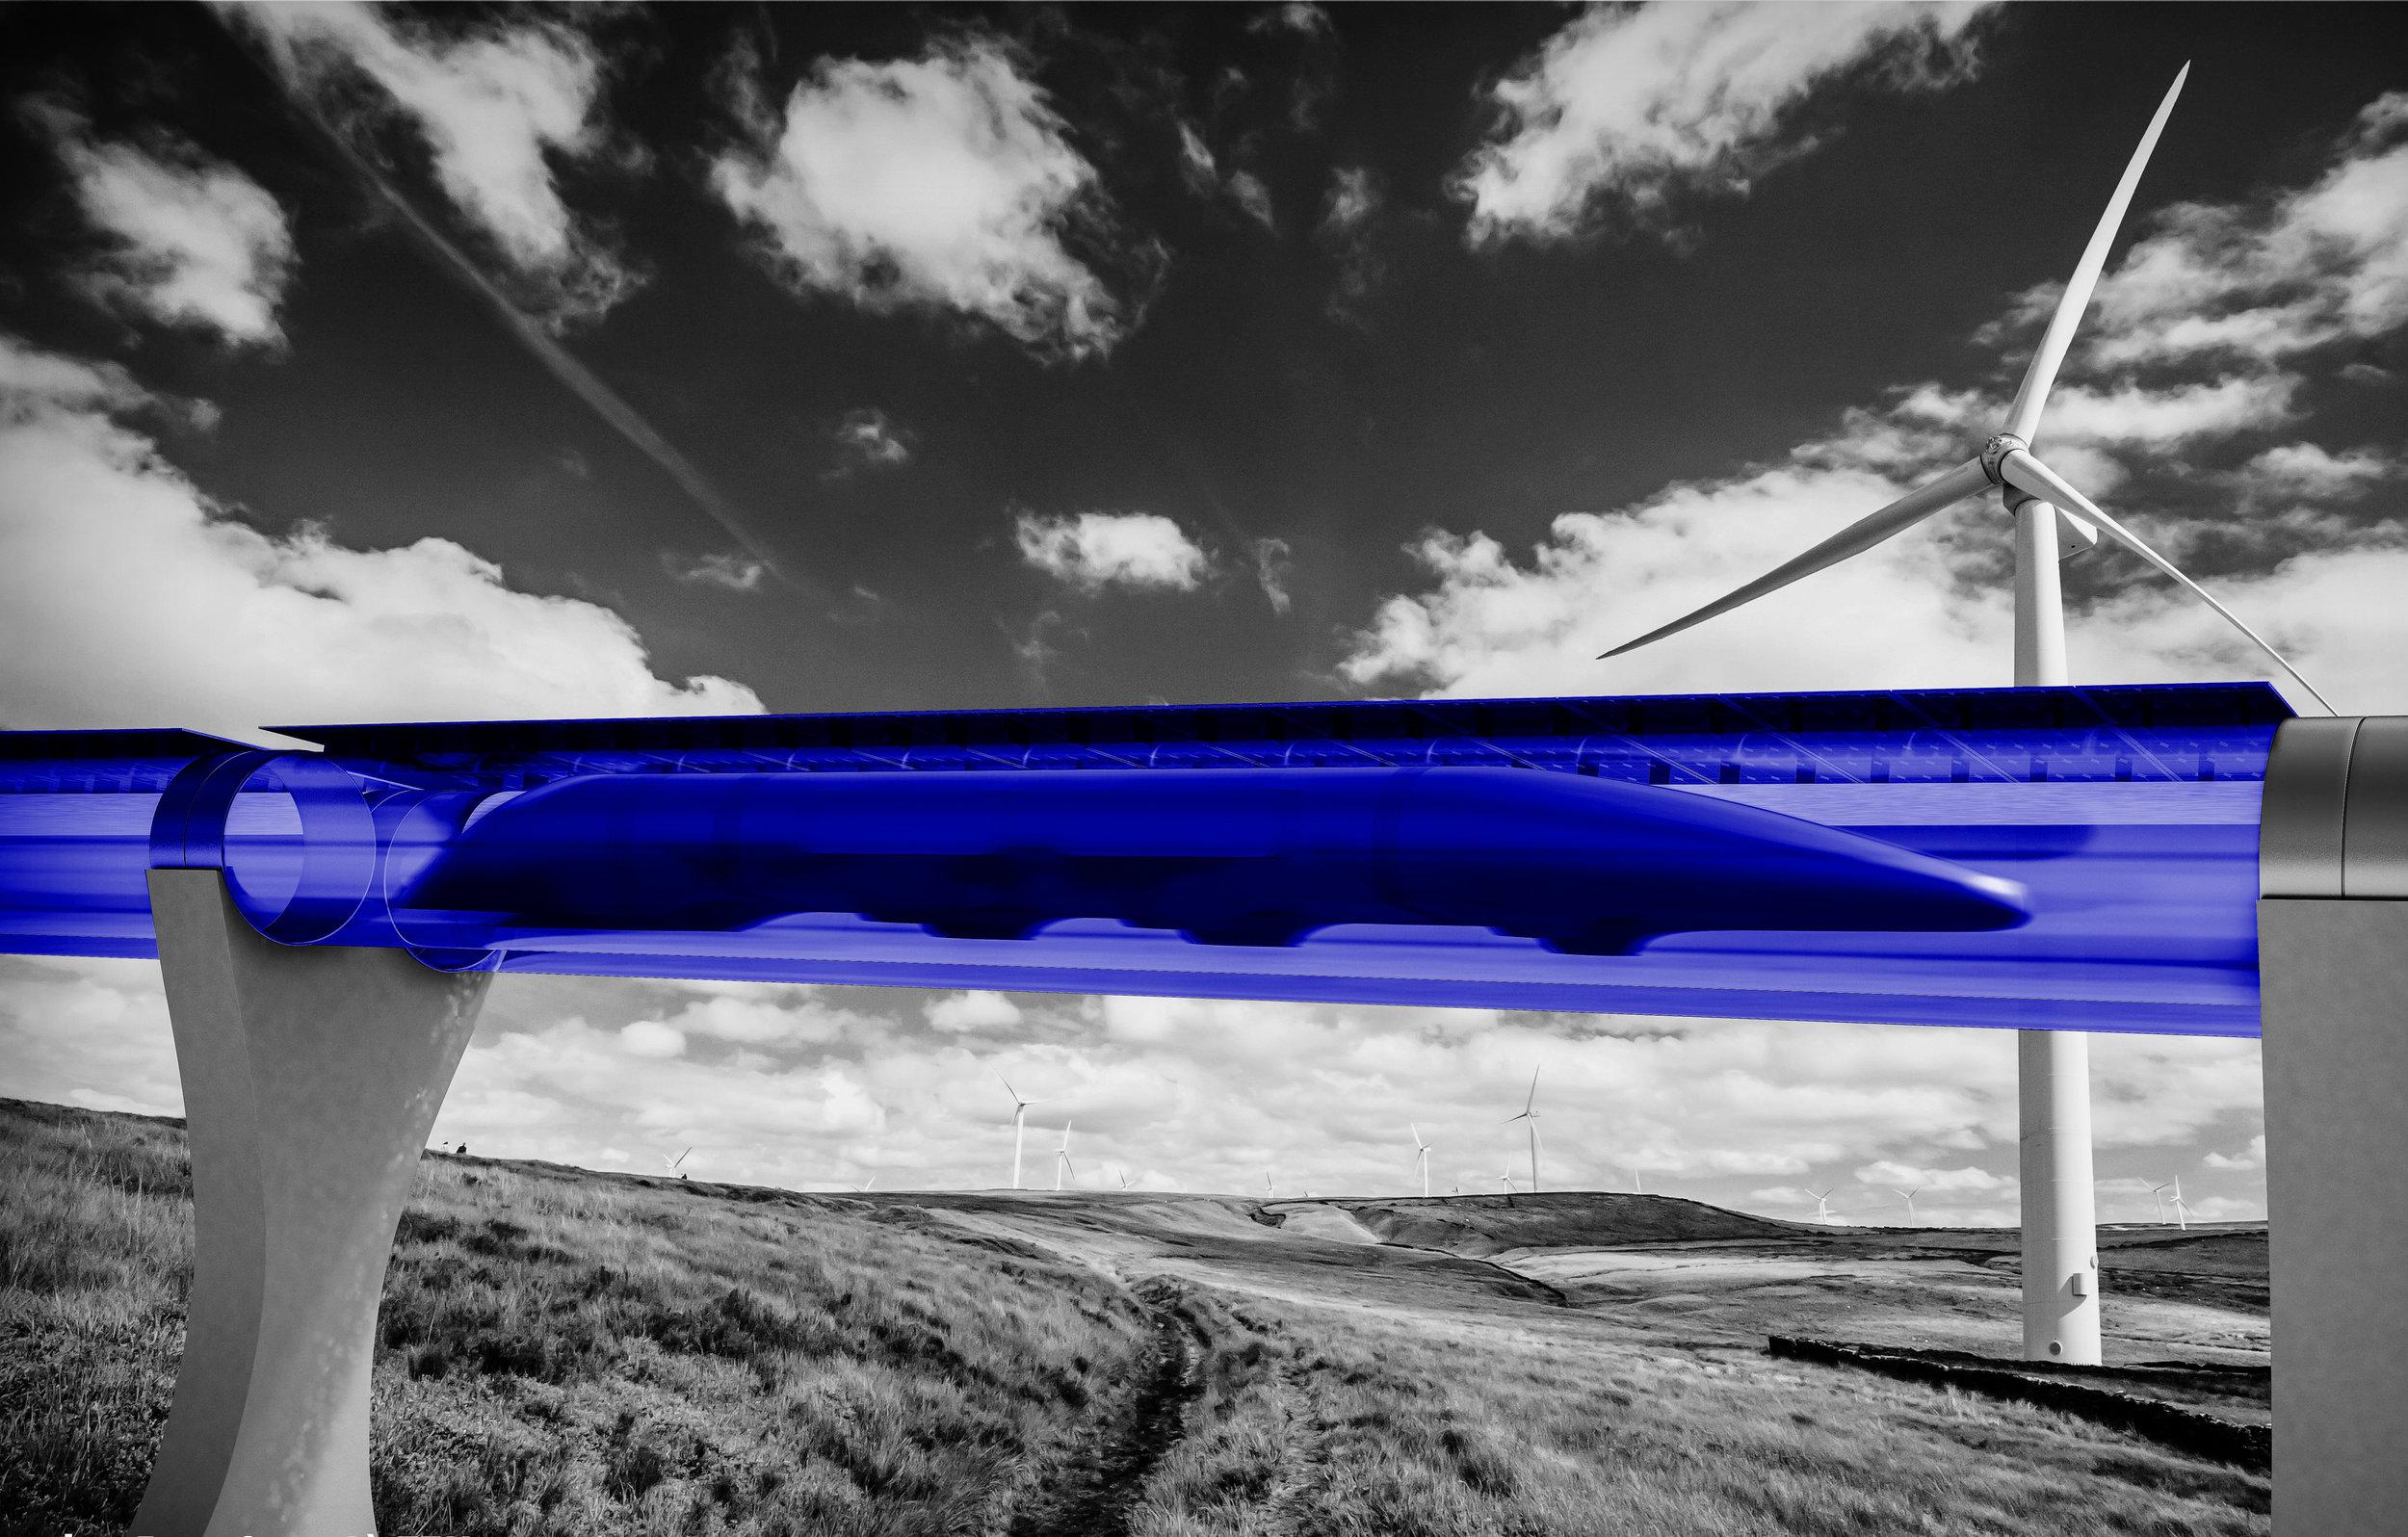 3_hyperloop_hyperloop_concept_nature_02_transparent_copyright_2014_omegabyte3d_c_Editspotcolor.jpg